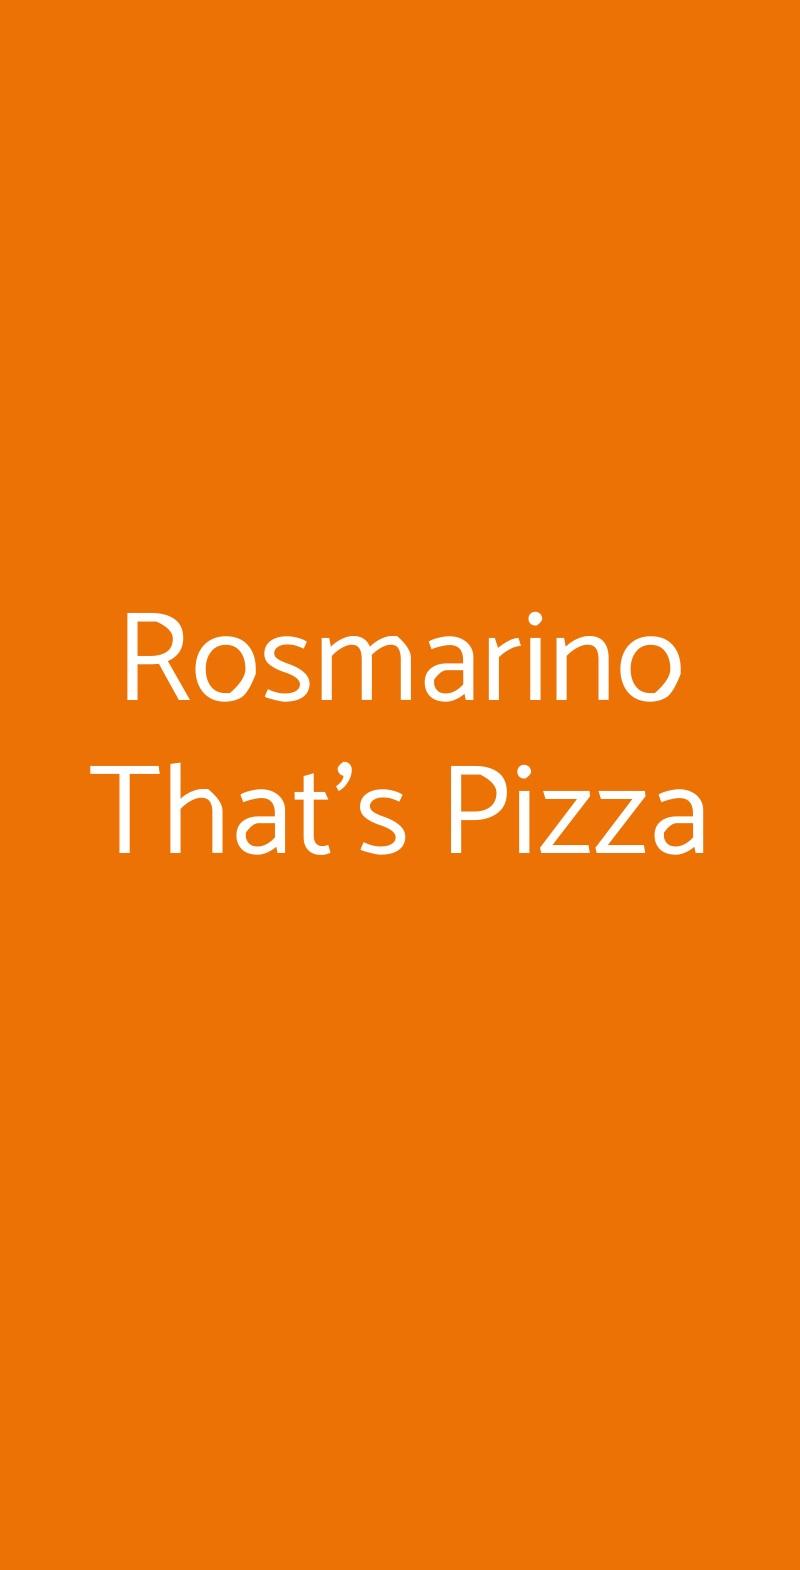 Rosmarino That's Pizza Roma menù 1 pagina